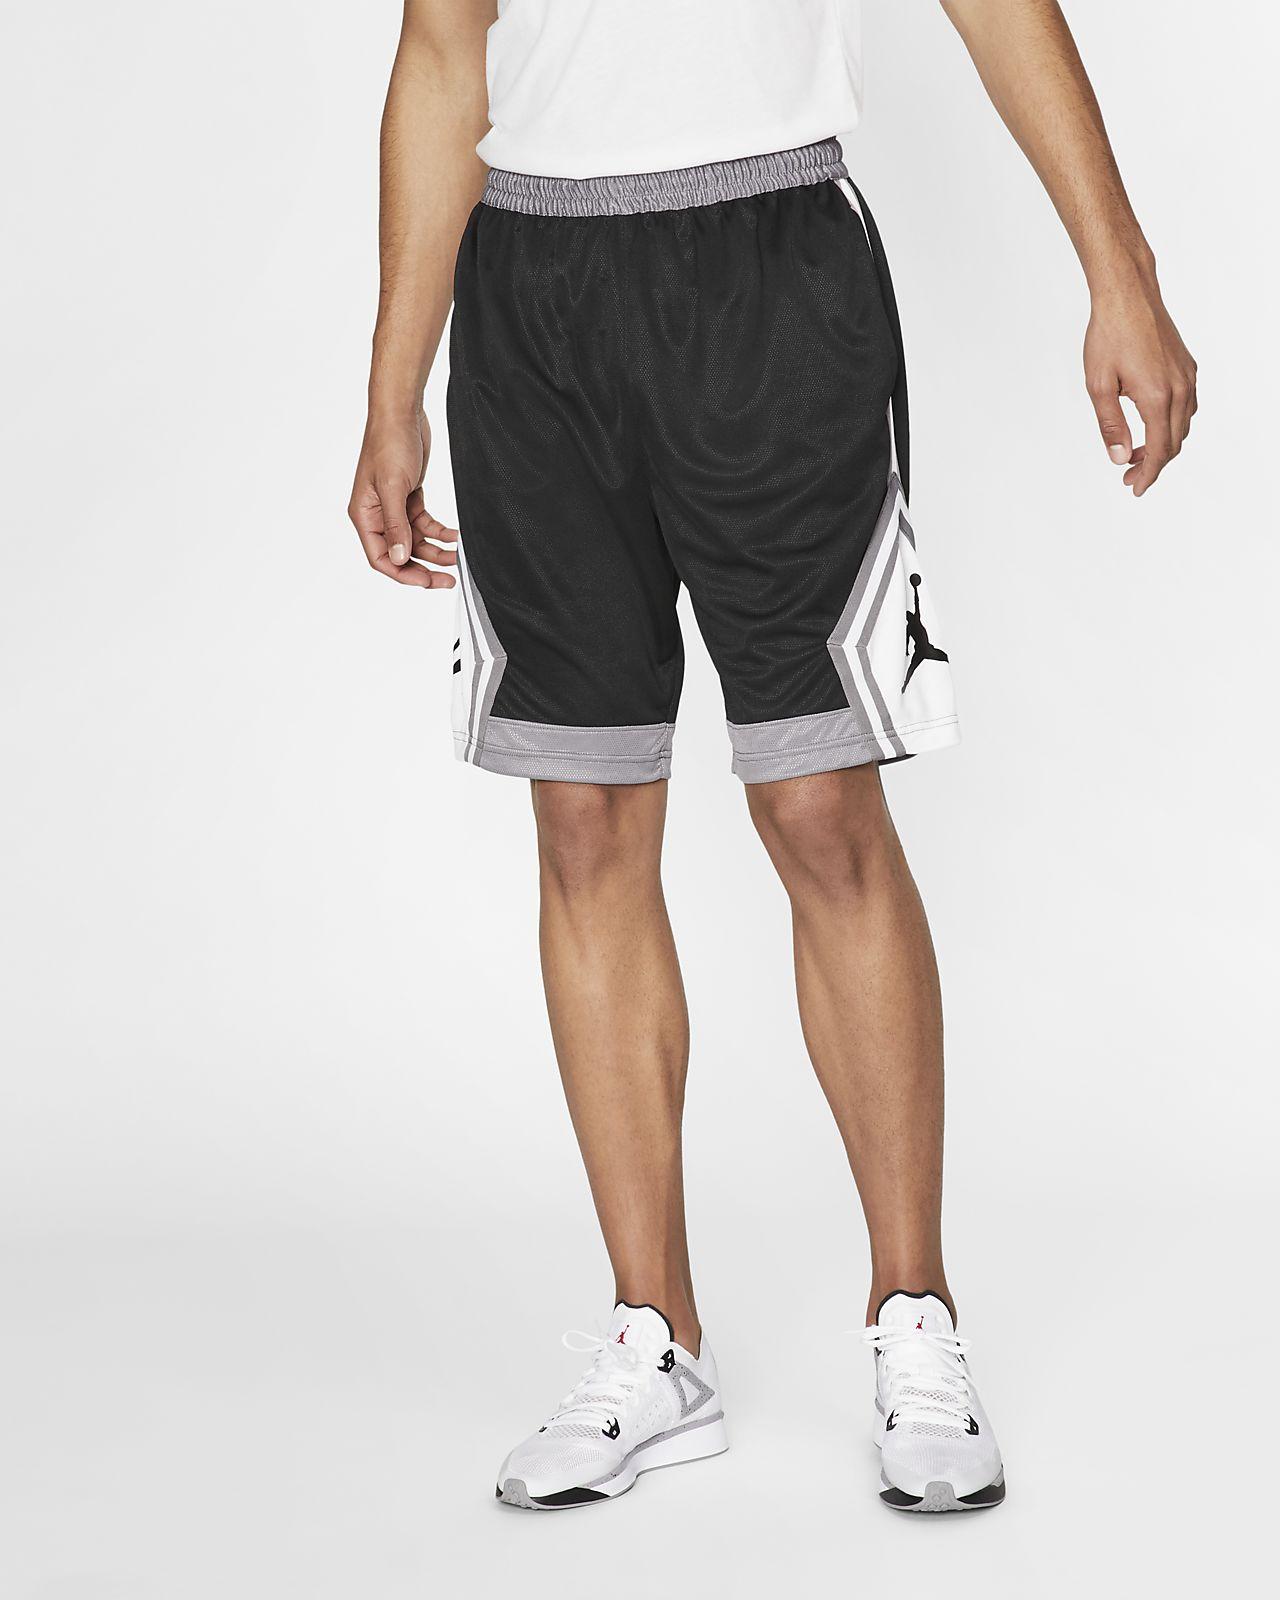 429aca9a9fd Jordan Jumpman Diamond Men's Striped Basketball Shorts. Nike.com AU